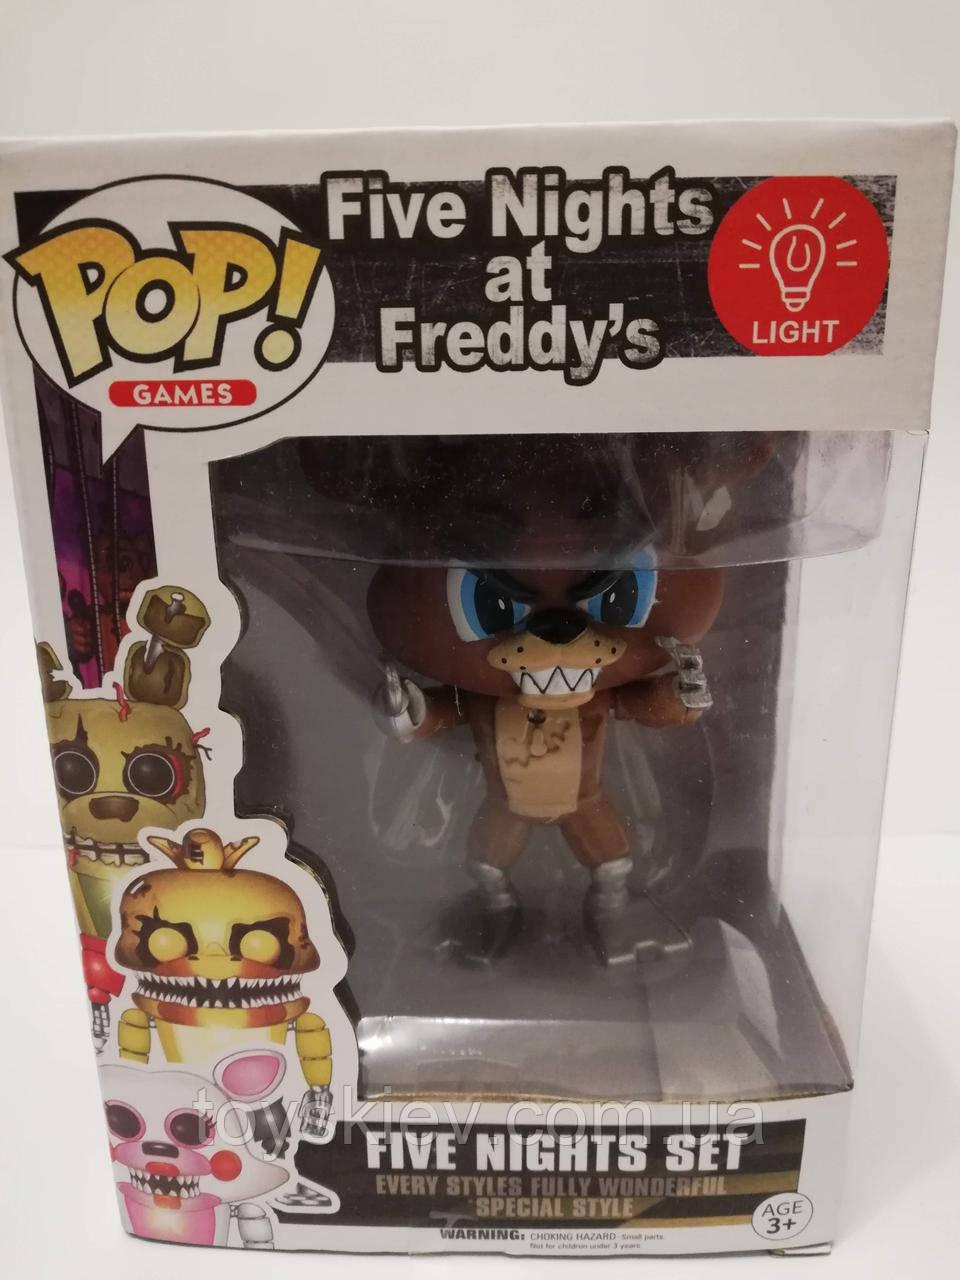 Игрушки 5 пять ночей с Фредди, Фредди / Funko Five Nights at Freddy's, Freddy 2011-3 свет эффекты.